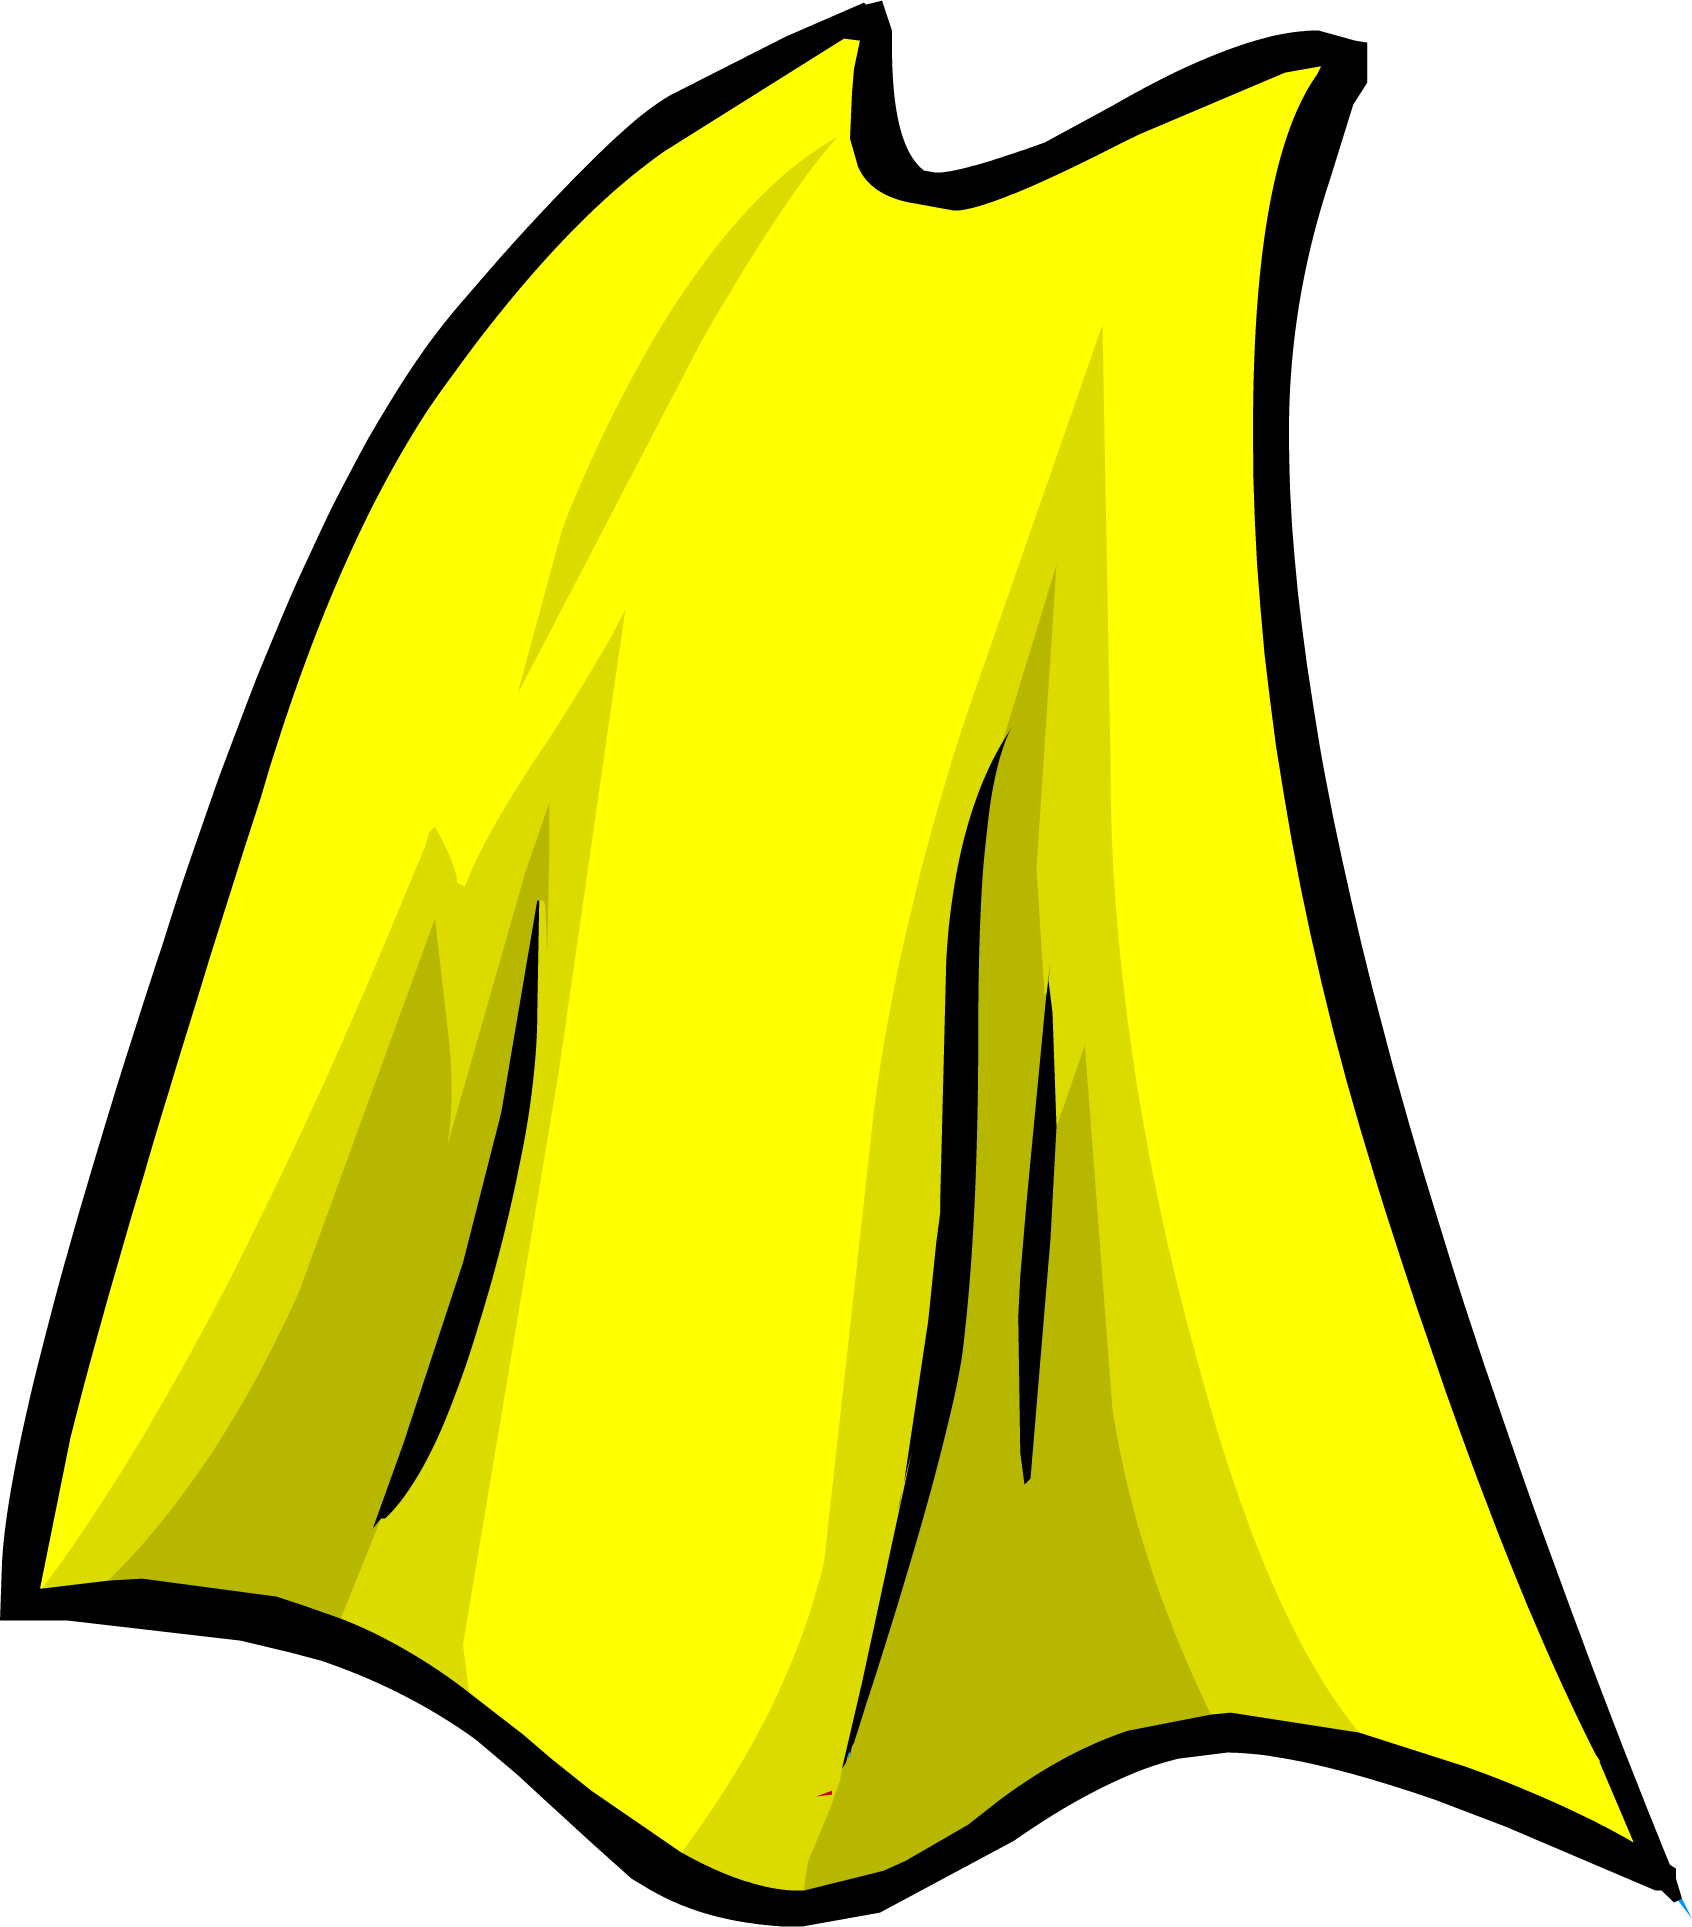 yellow cape club penguin wiki fandom powered by wikia sea creatures clipart sea creatures clipart